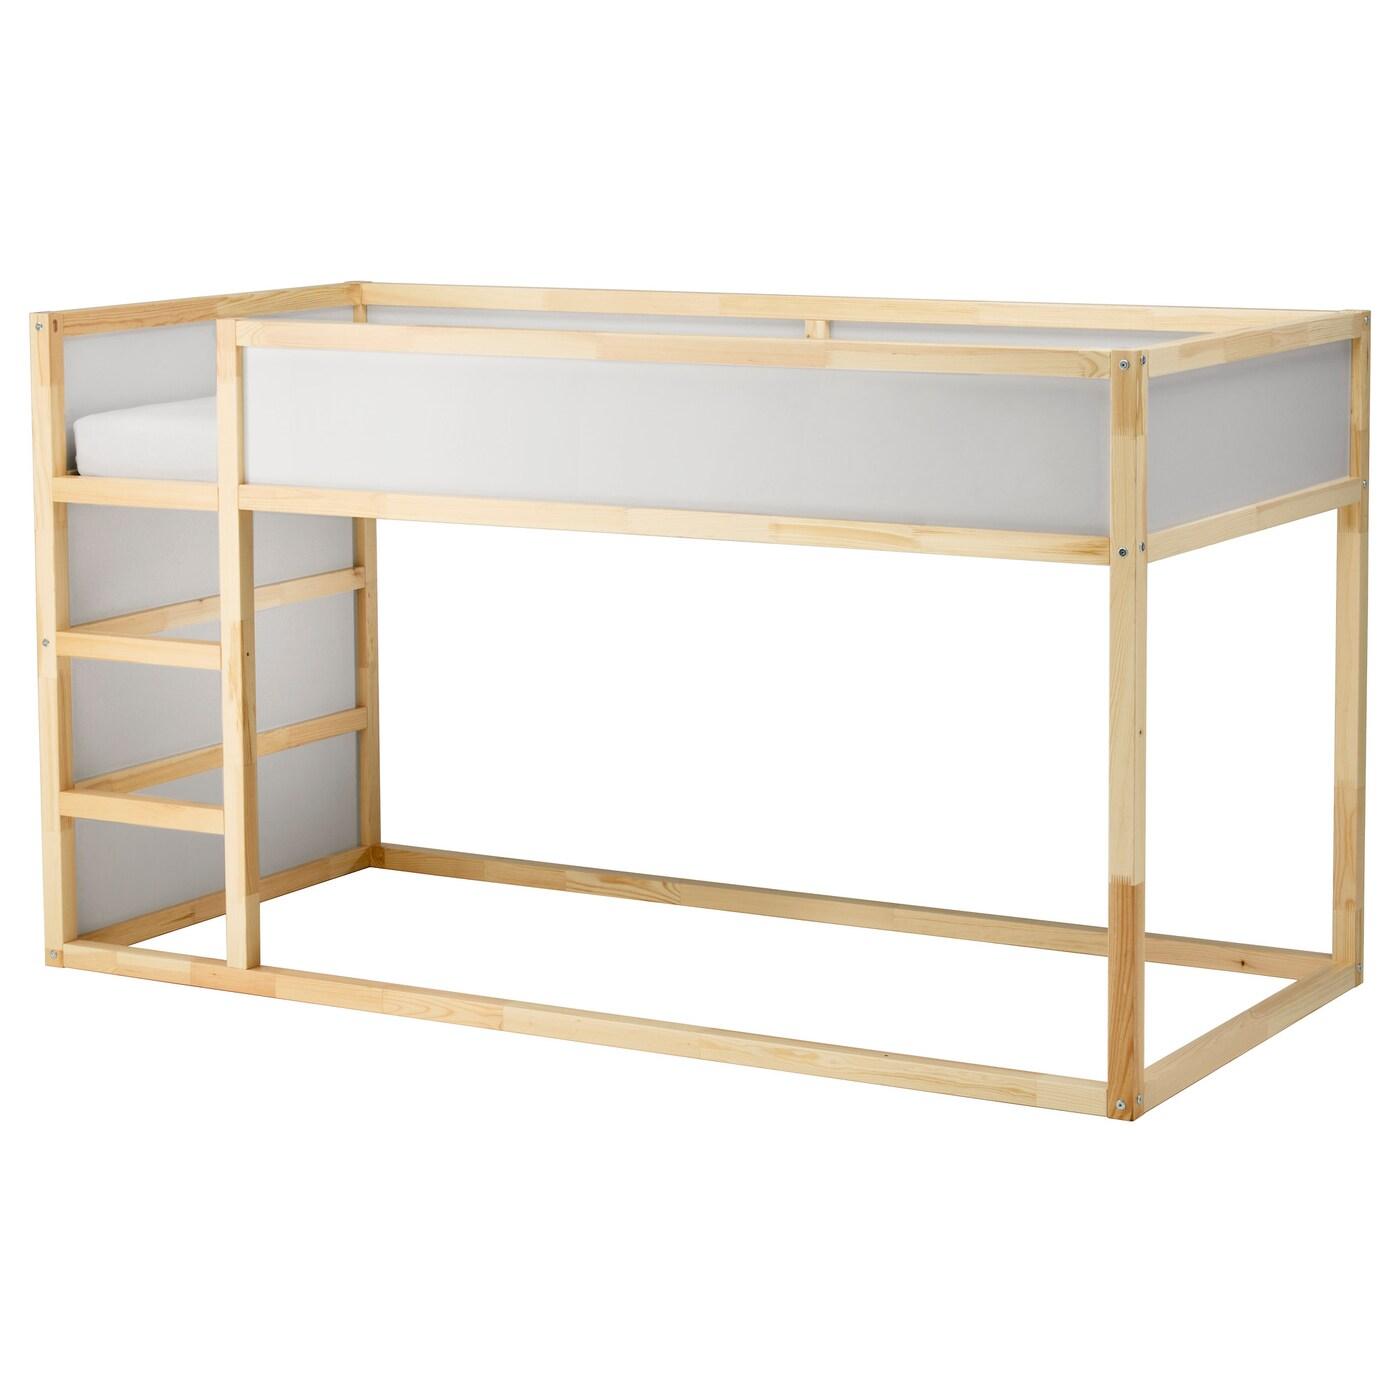 Picture of: Kura Reversible Bed White Pine 90×200 Cm Ikea Ireland